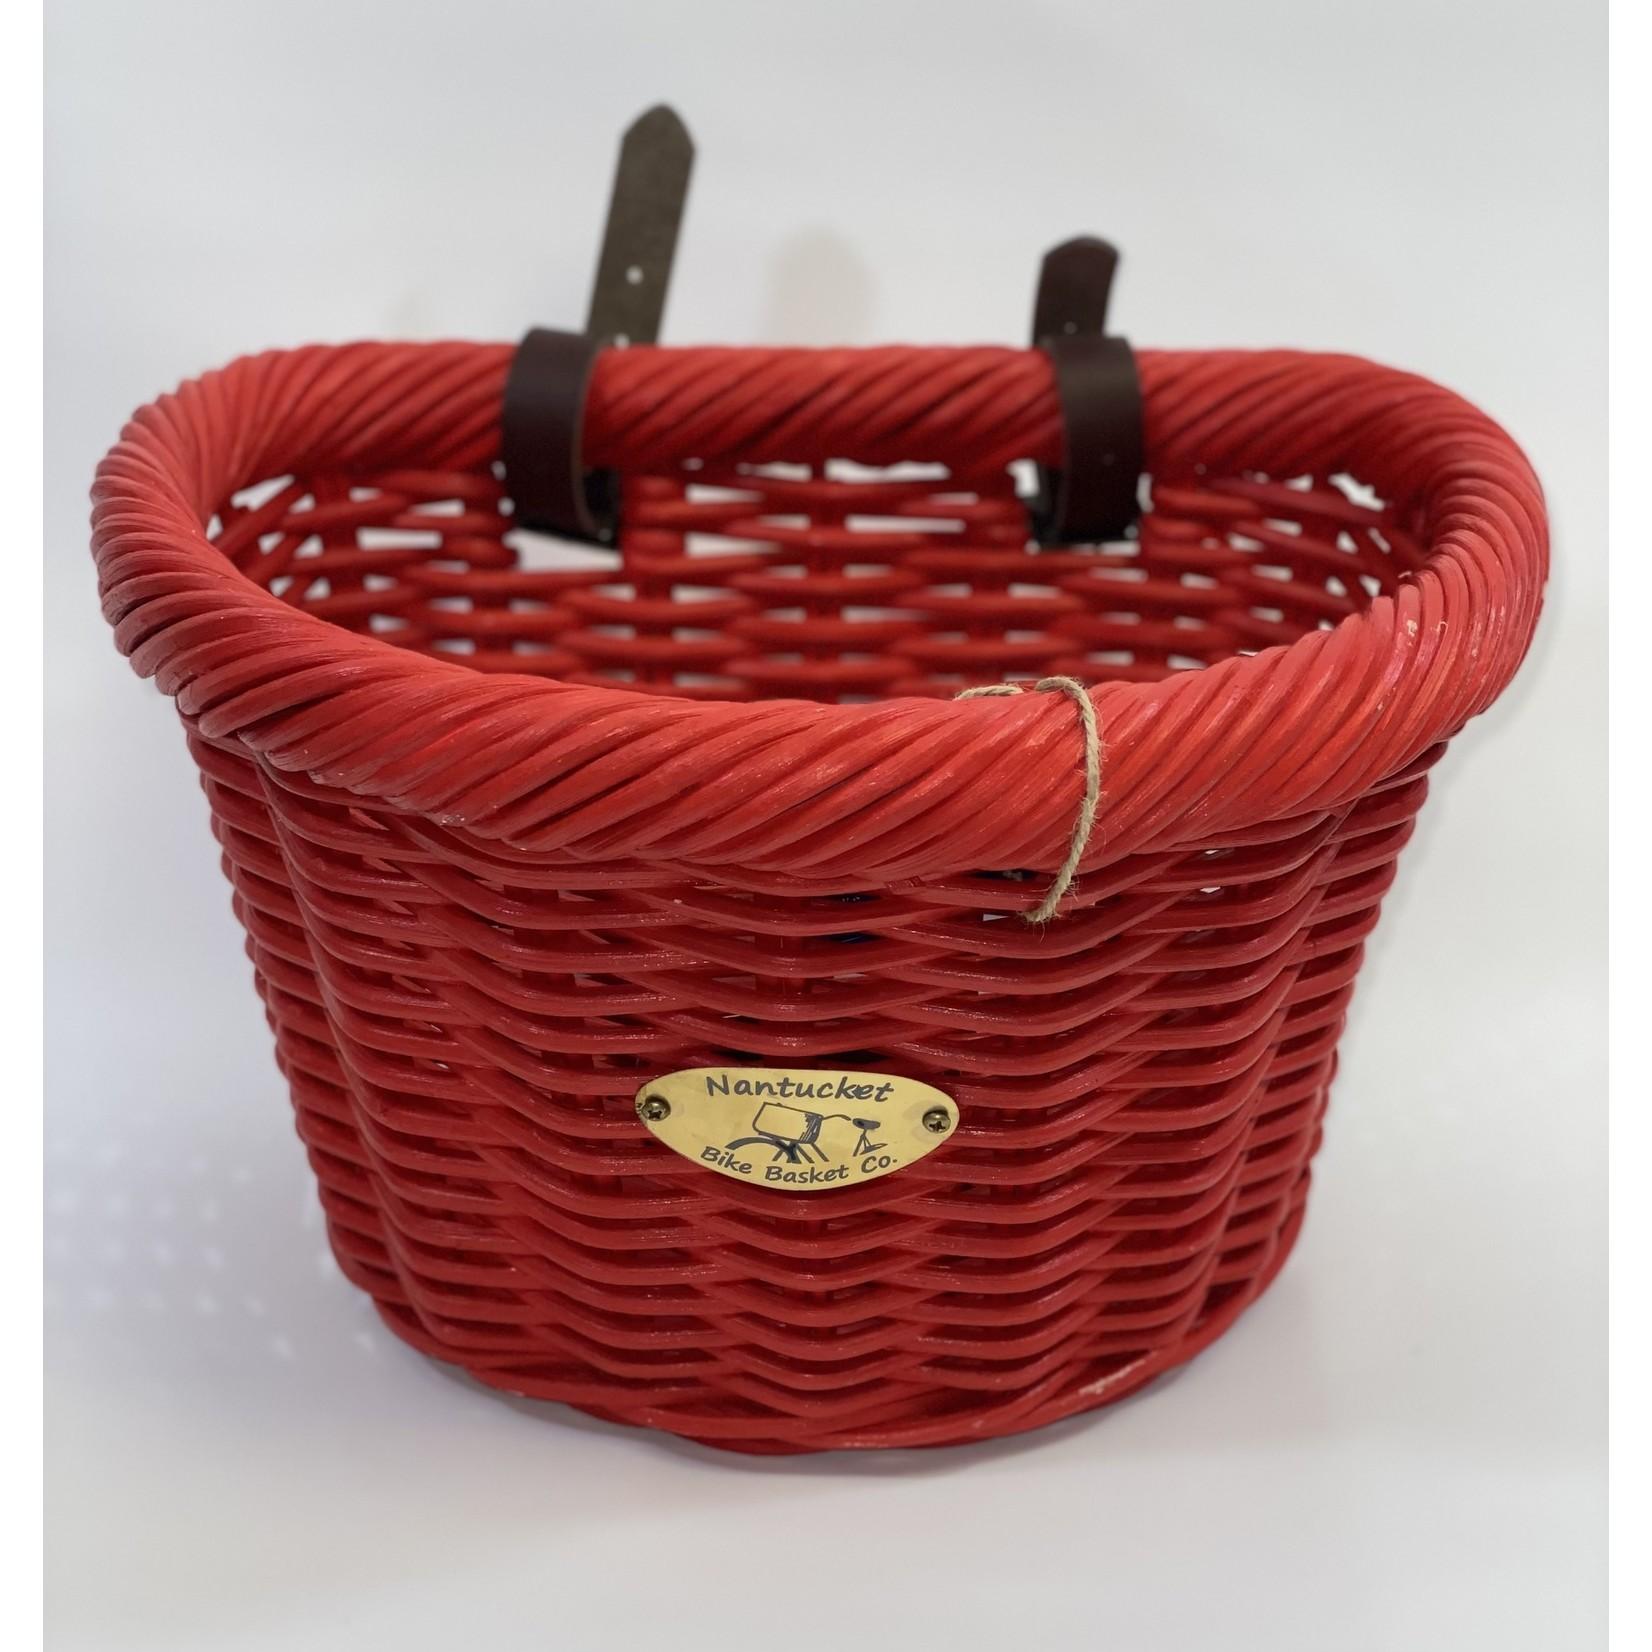 Nantucket Bike Basket Co. Basket - Nantucket Cruiser D Red